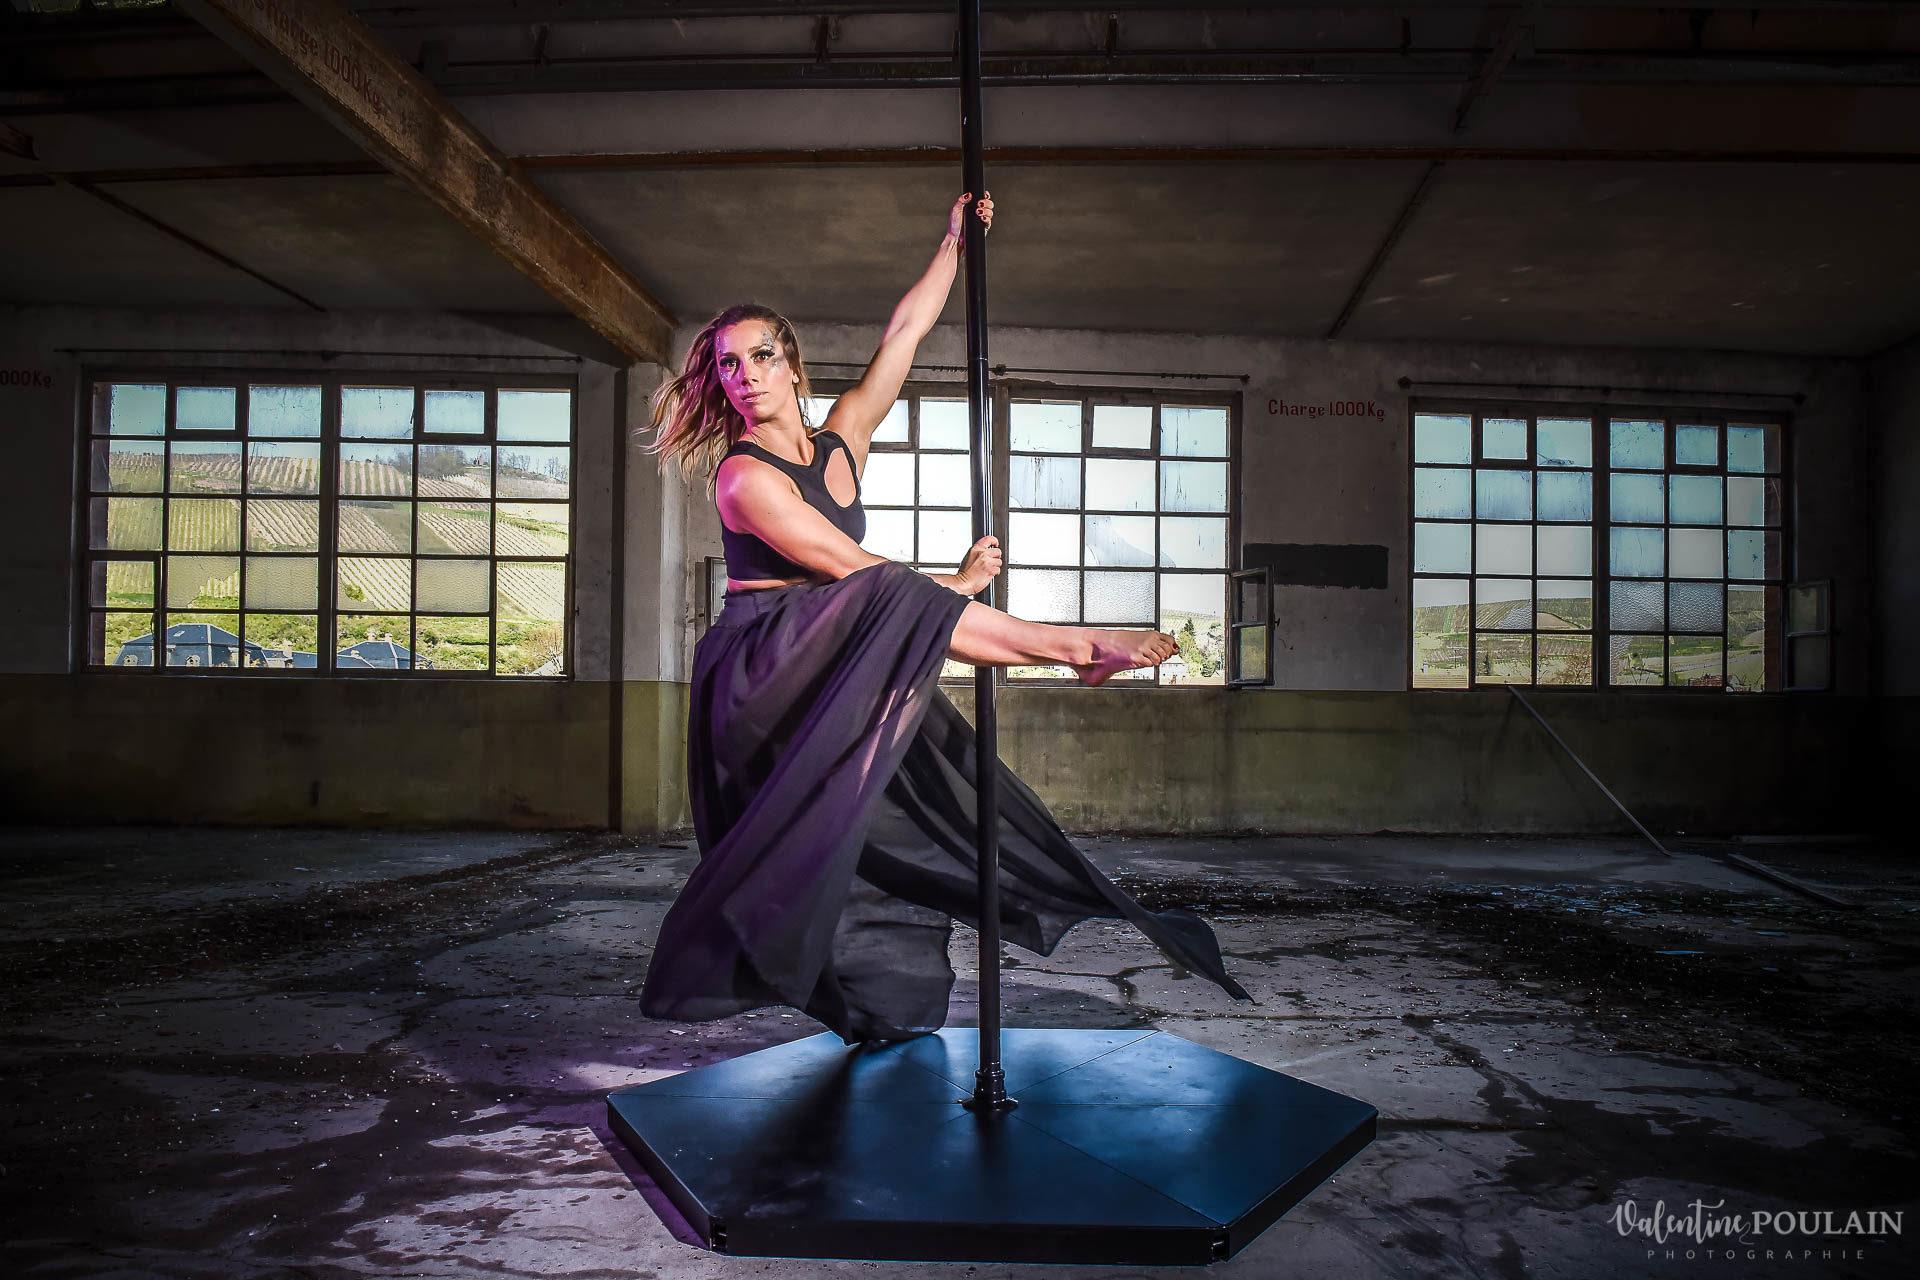 Shooting Pole Dance gymnastique - Valentine Poulain lancer